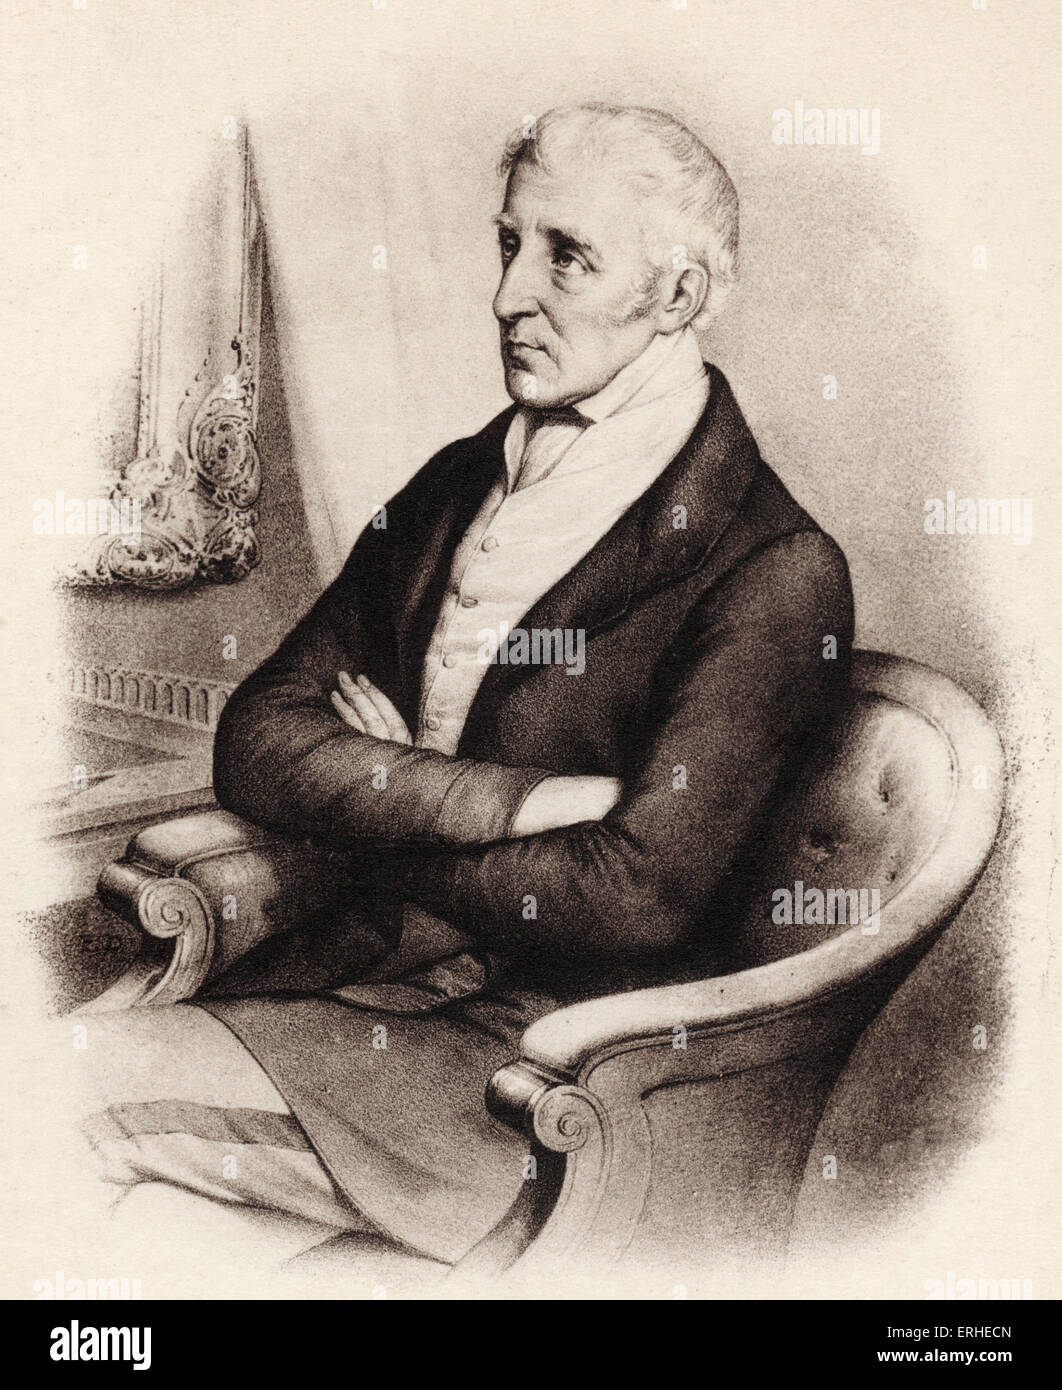 1st Duke of Wellington (Arthur Wellesley) known as the Iron Duke - Irish-born soldier and statesman. 1769-1852 - Stock Image